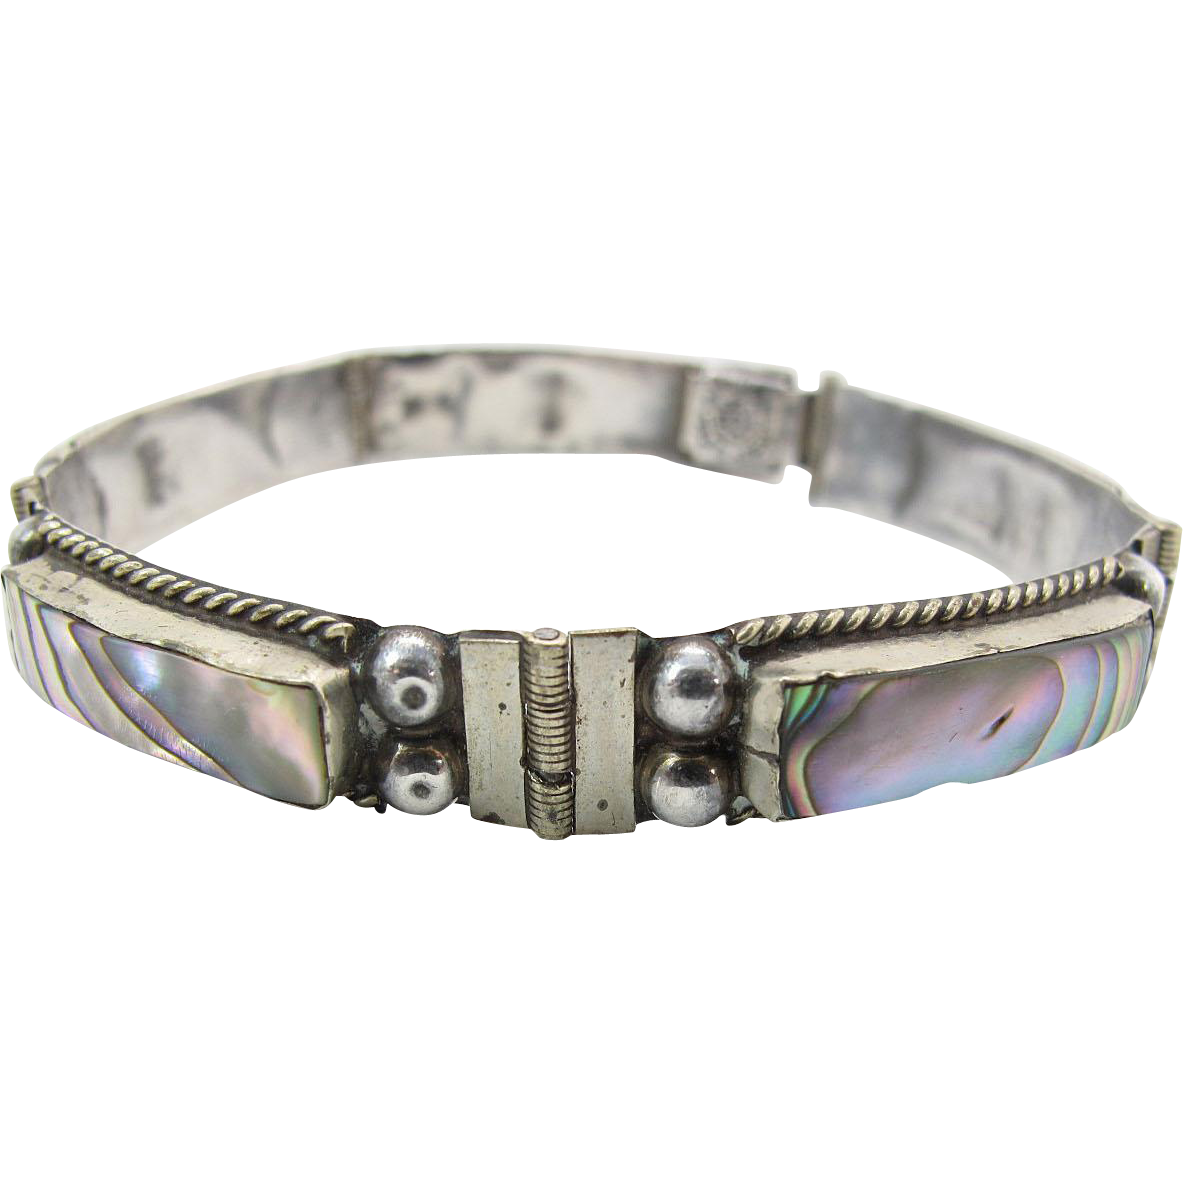 Vintage Mexican Bracelet 104